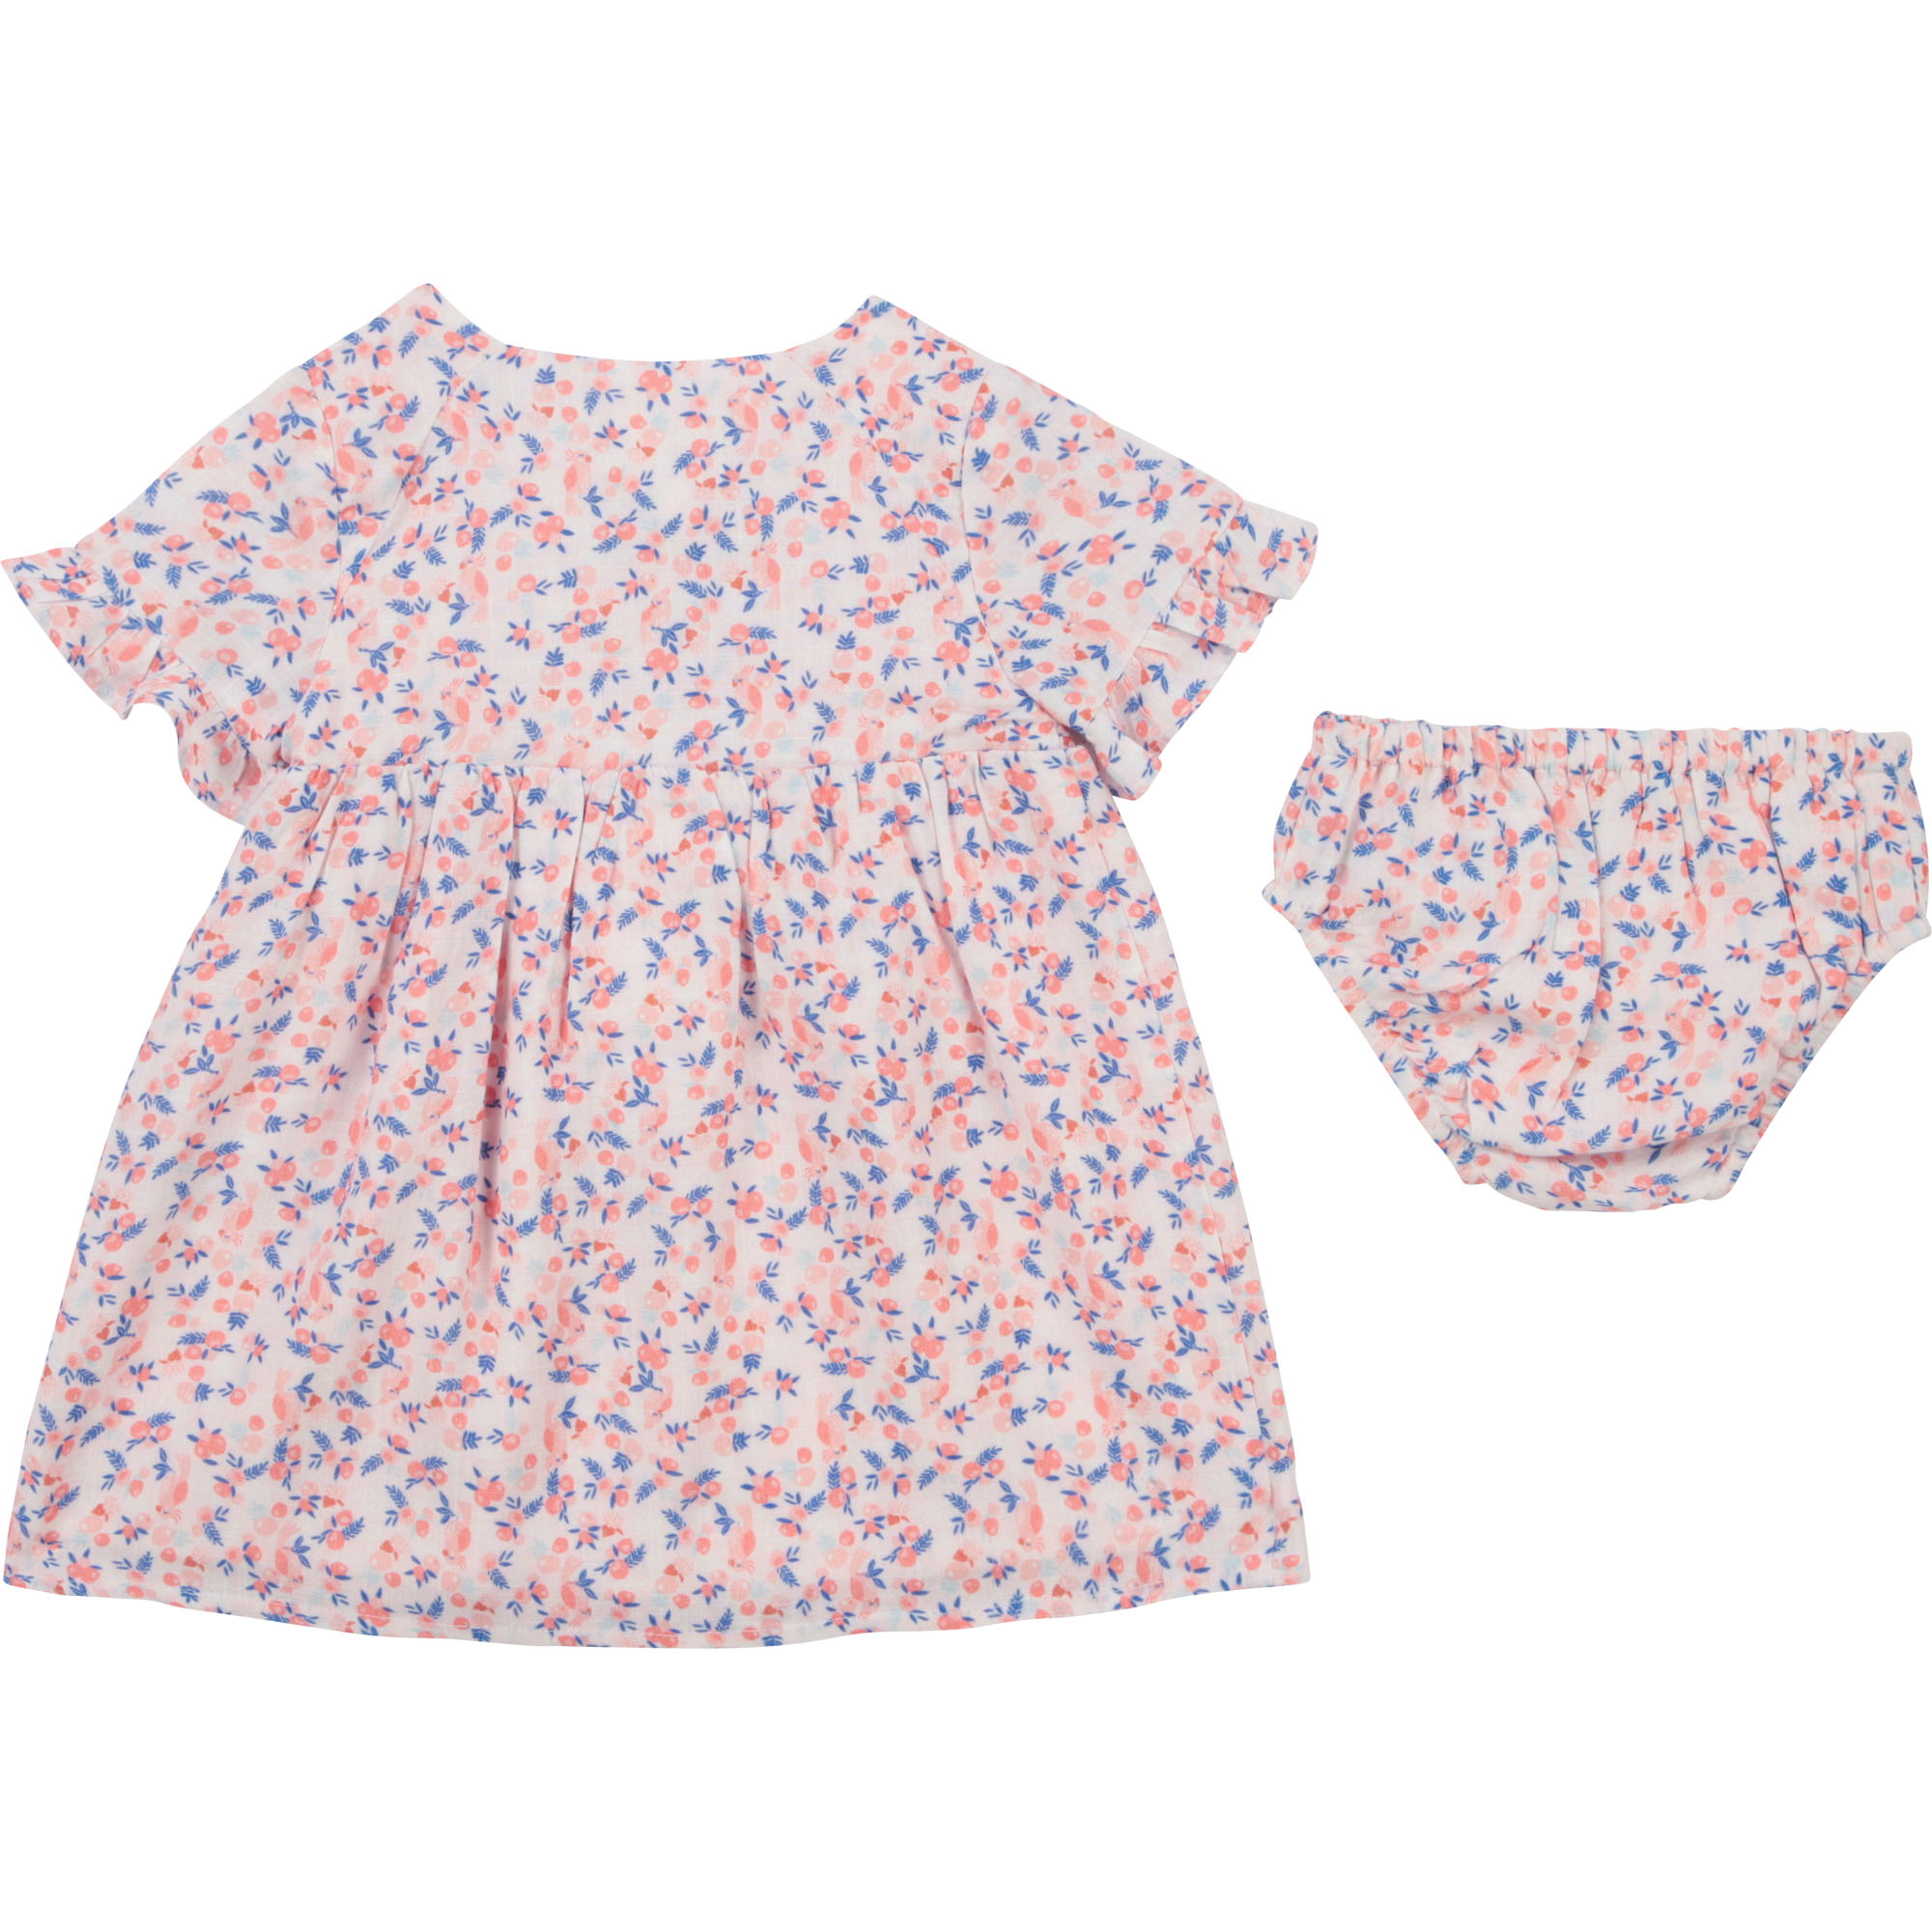 Dress + bloomers set CARREMENT BEAU for GIRL